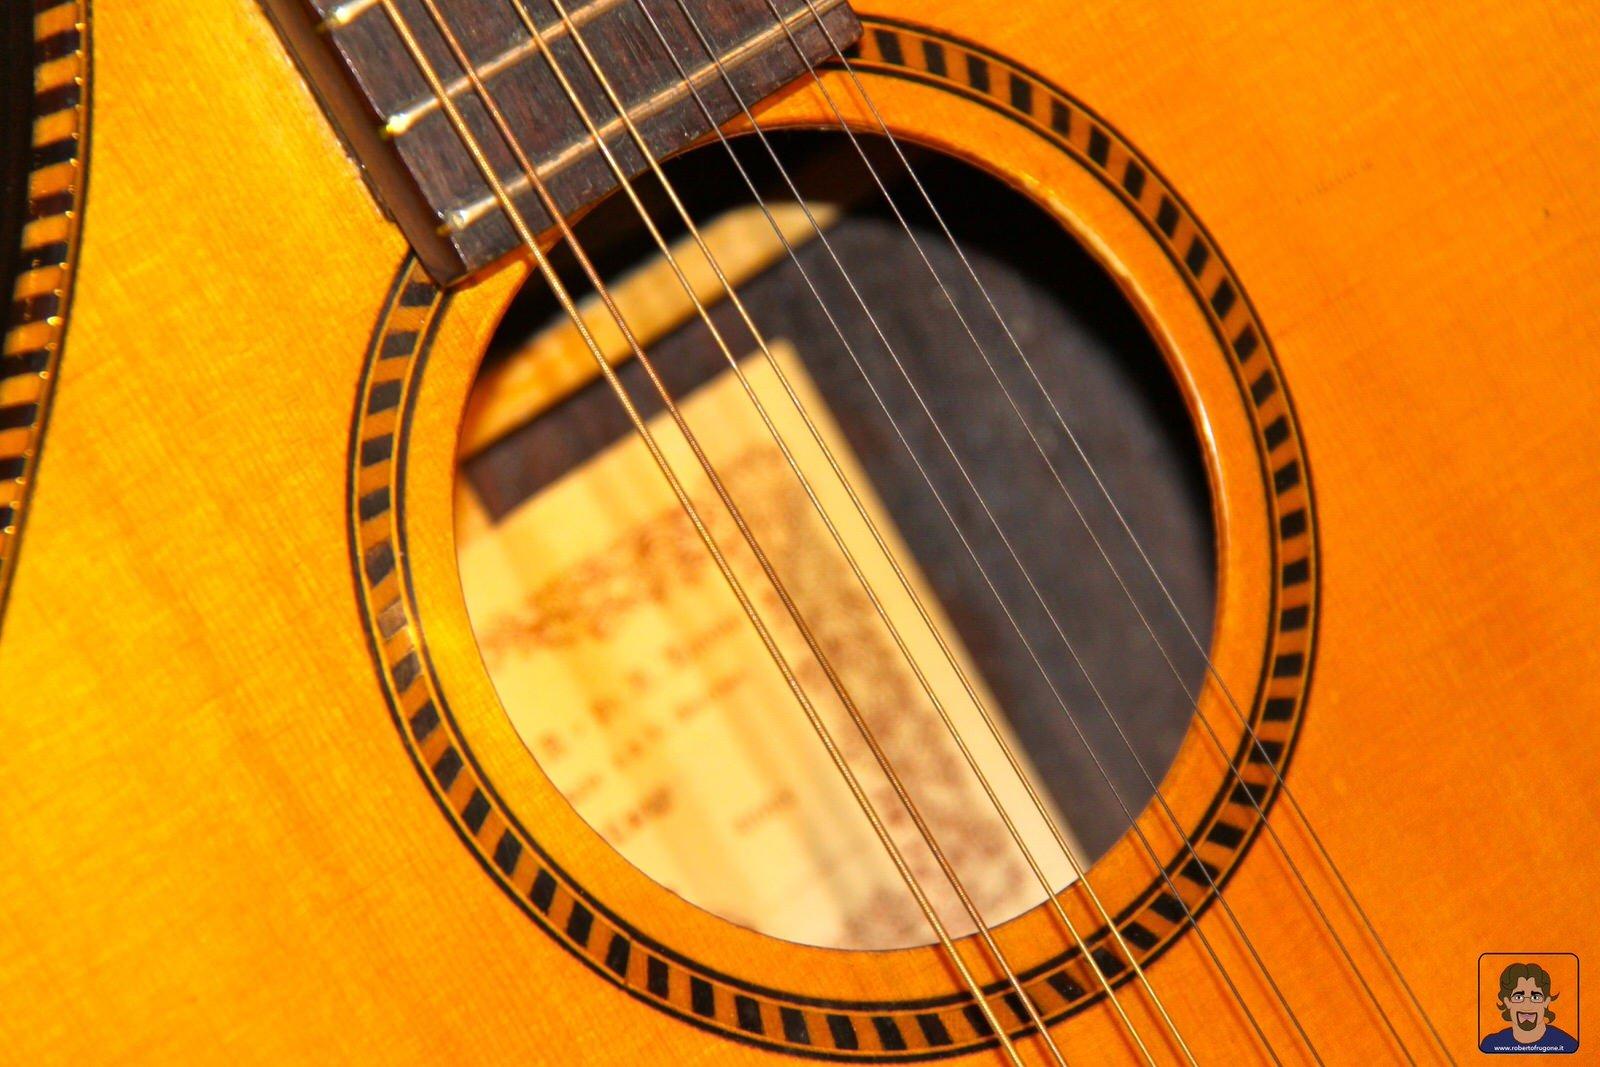 Totem Studio Sala Prove Musicali Casarza Ligure bouzouki